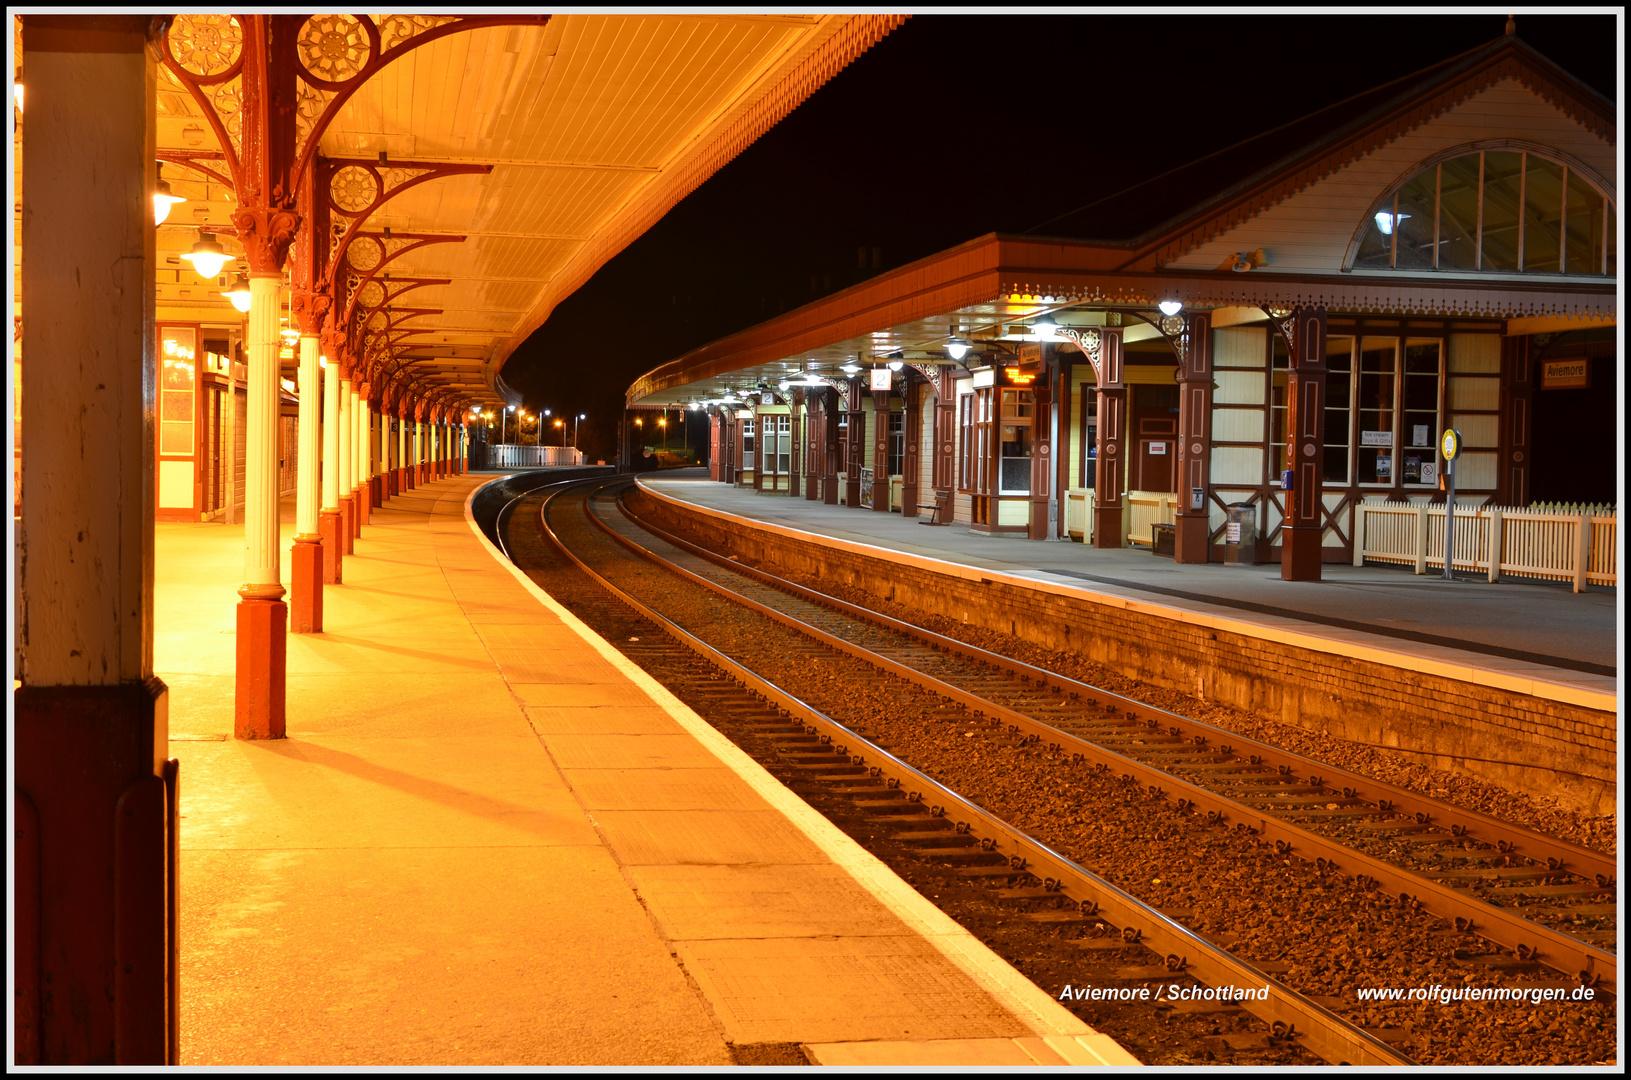 Nightshoot, Railway Station Aviemore